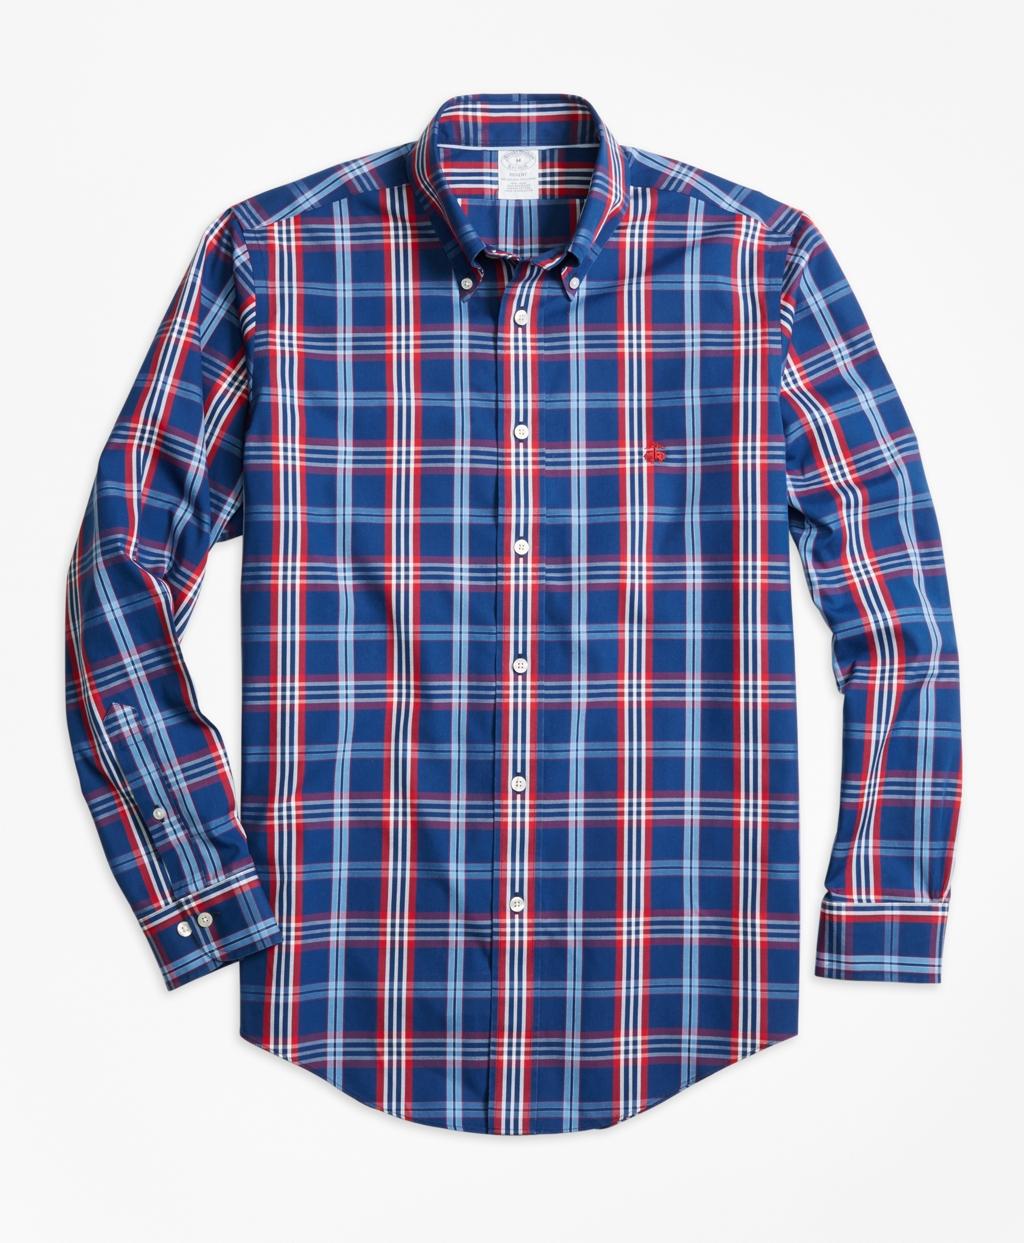 Brooks brothers non iron regent fit signature tartan sport for Brooks brothers sports shirts